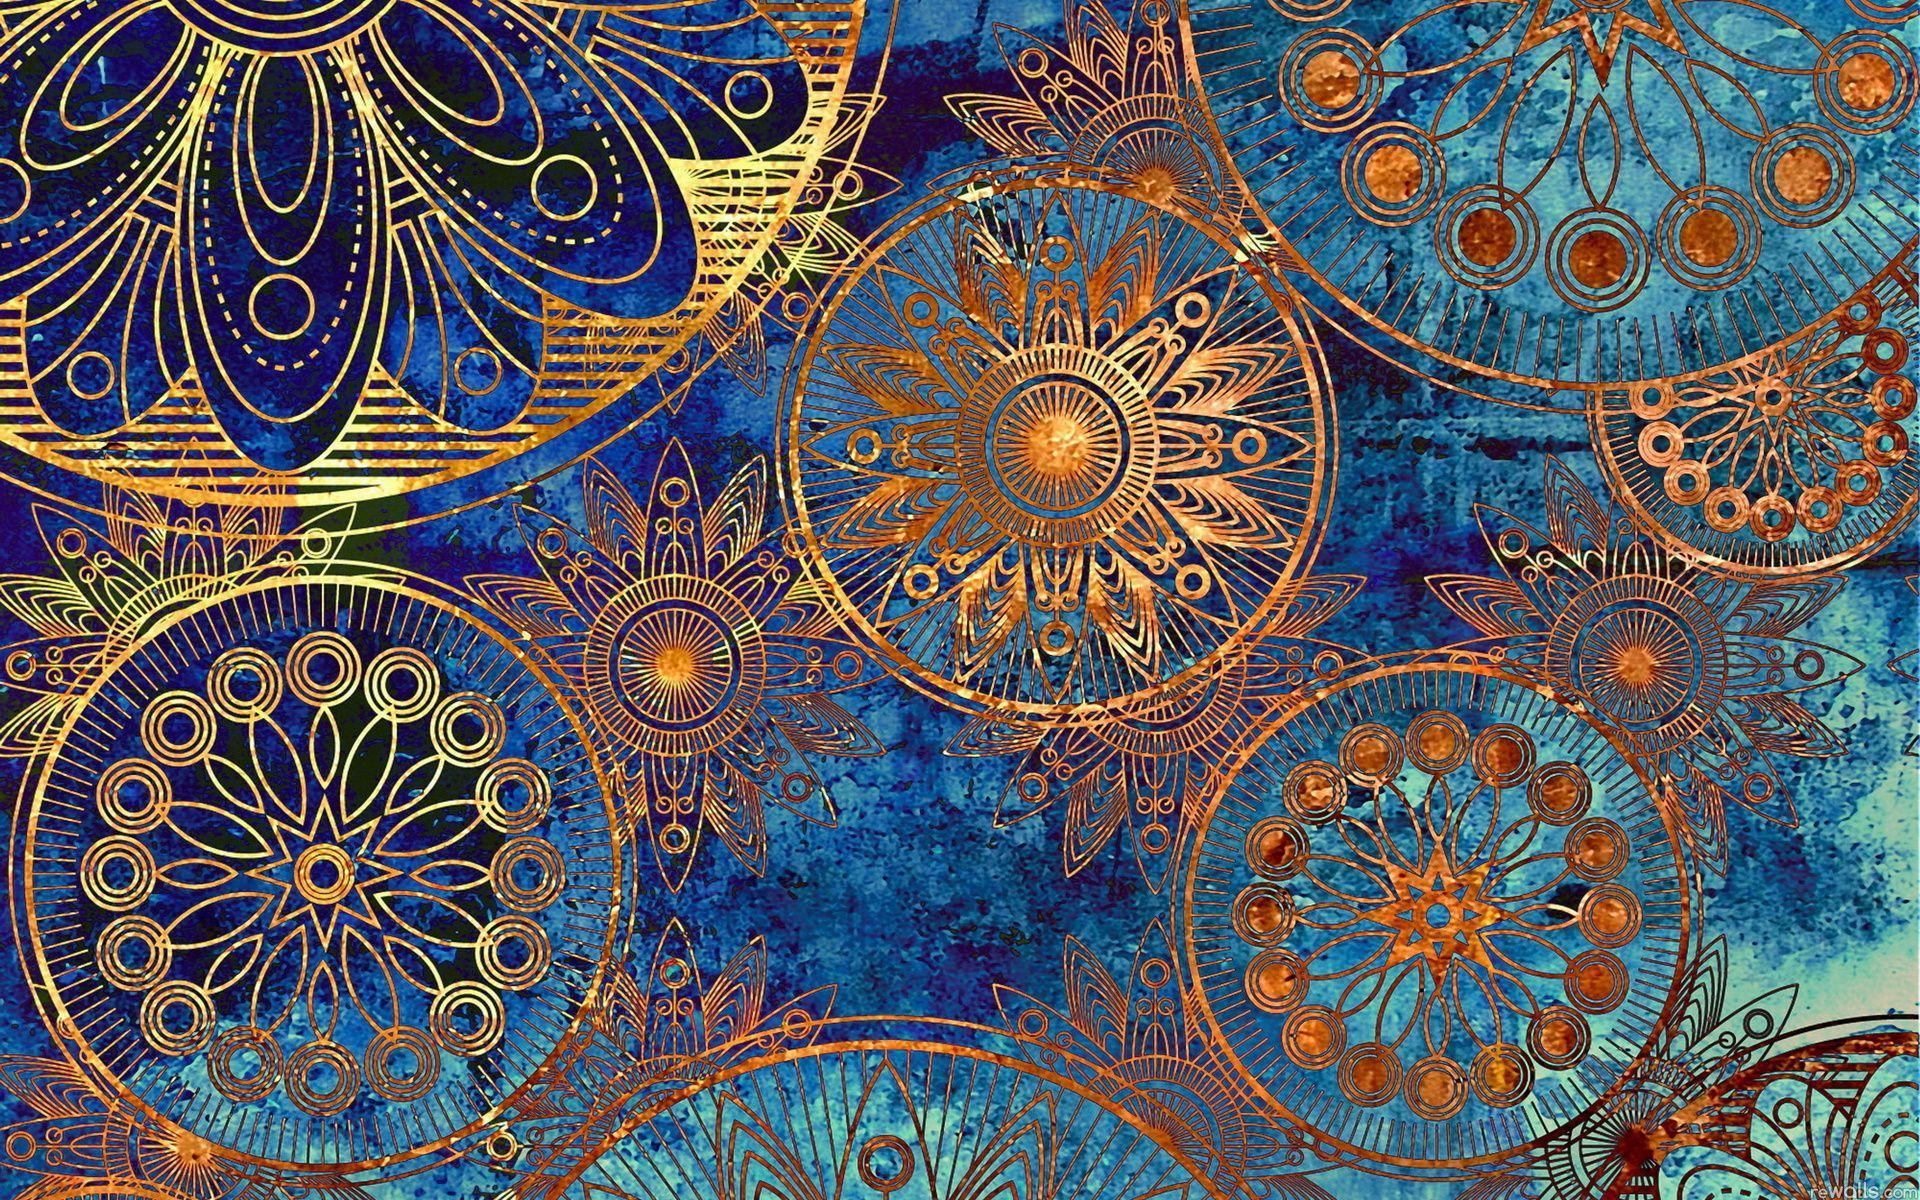 Retro Laptop Wallpapers Top Free Retro Laptop Backgrounds Wallpaperaccess